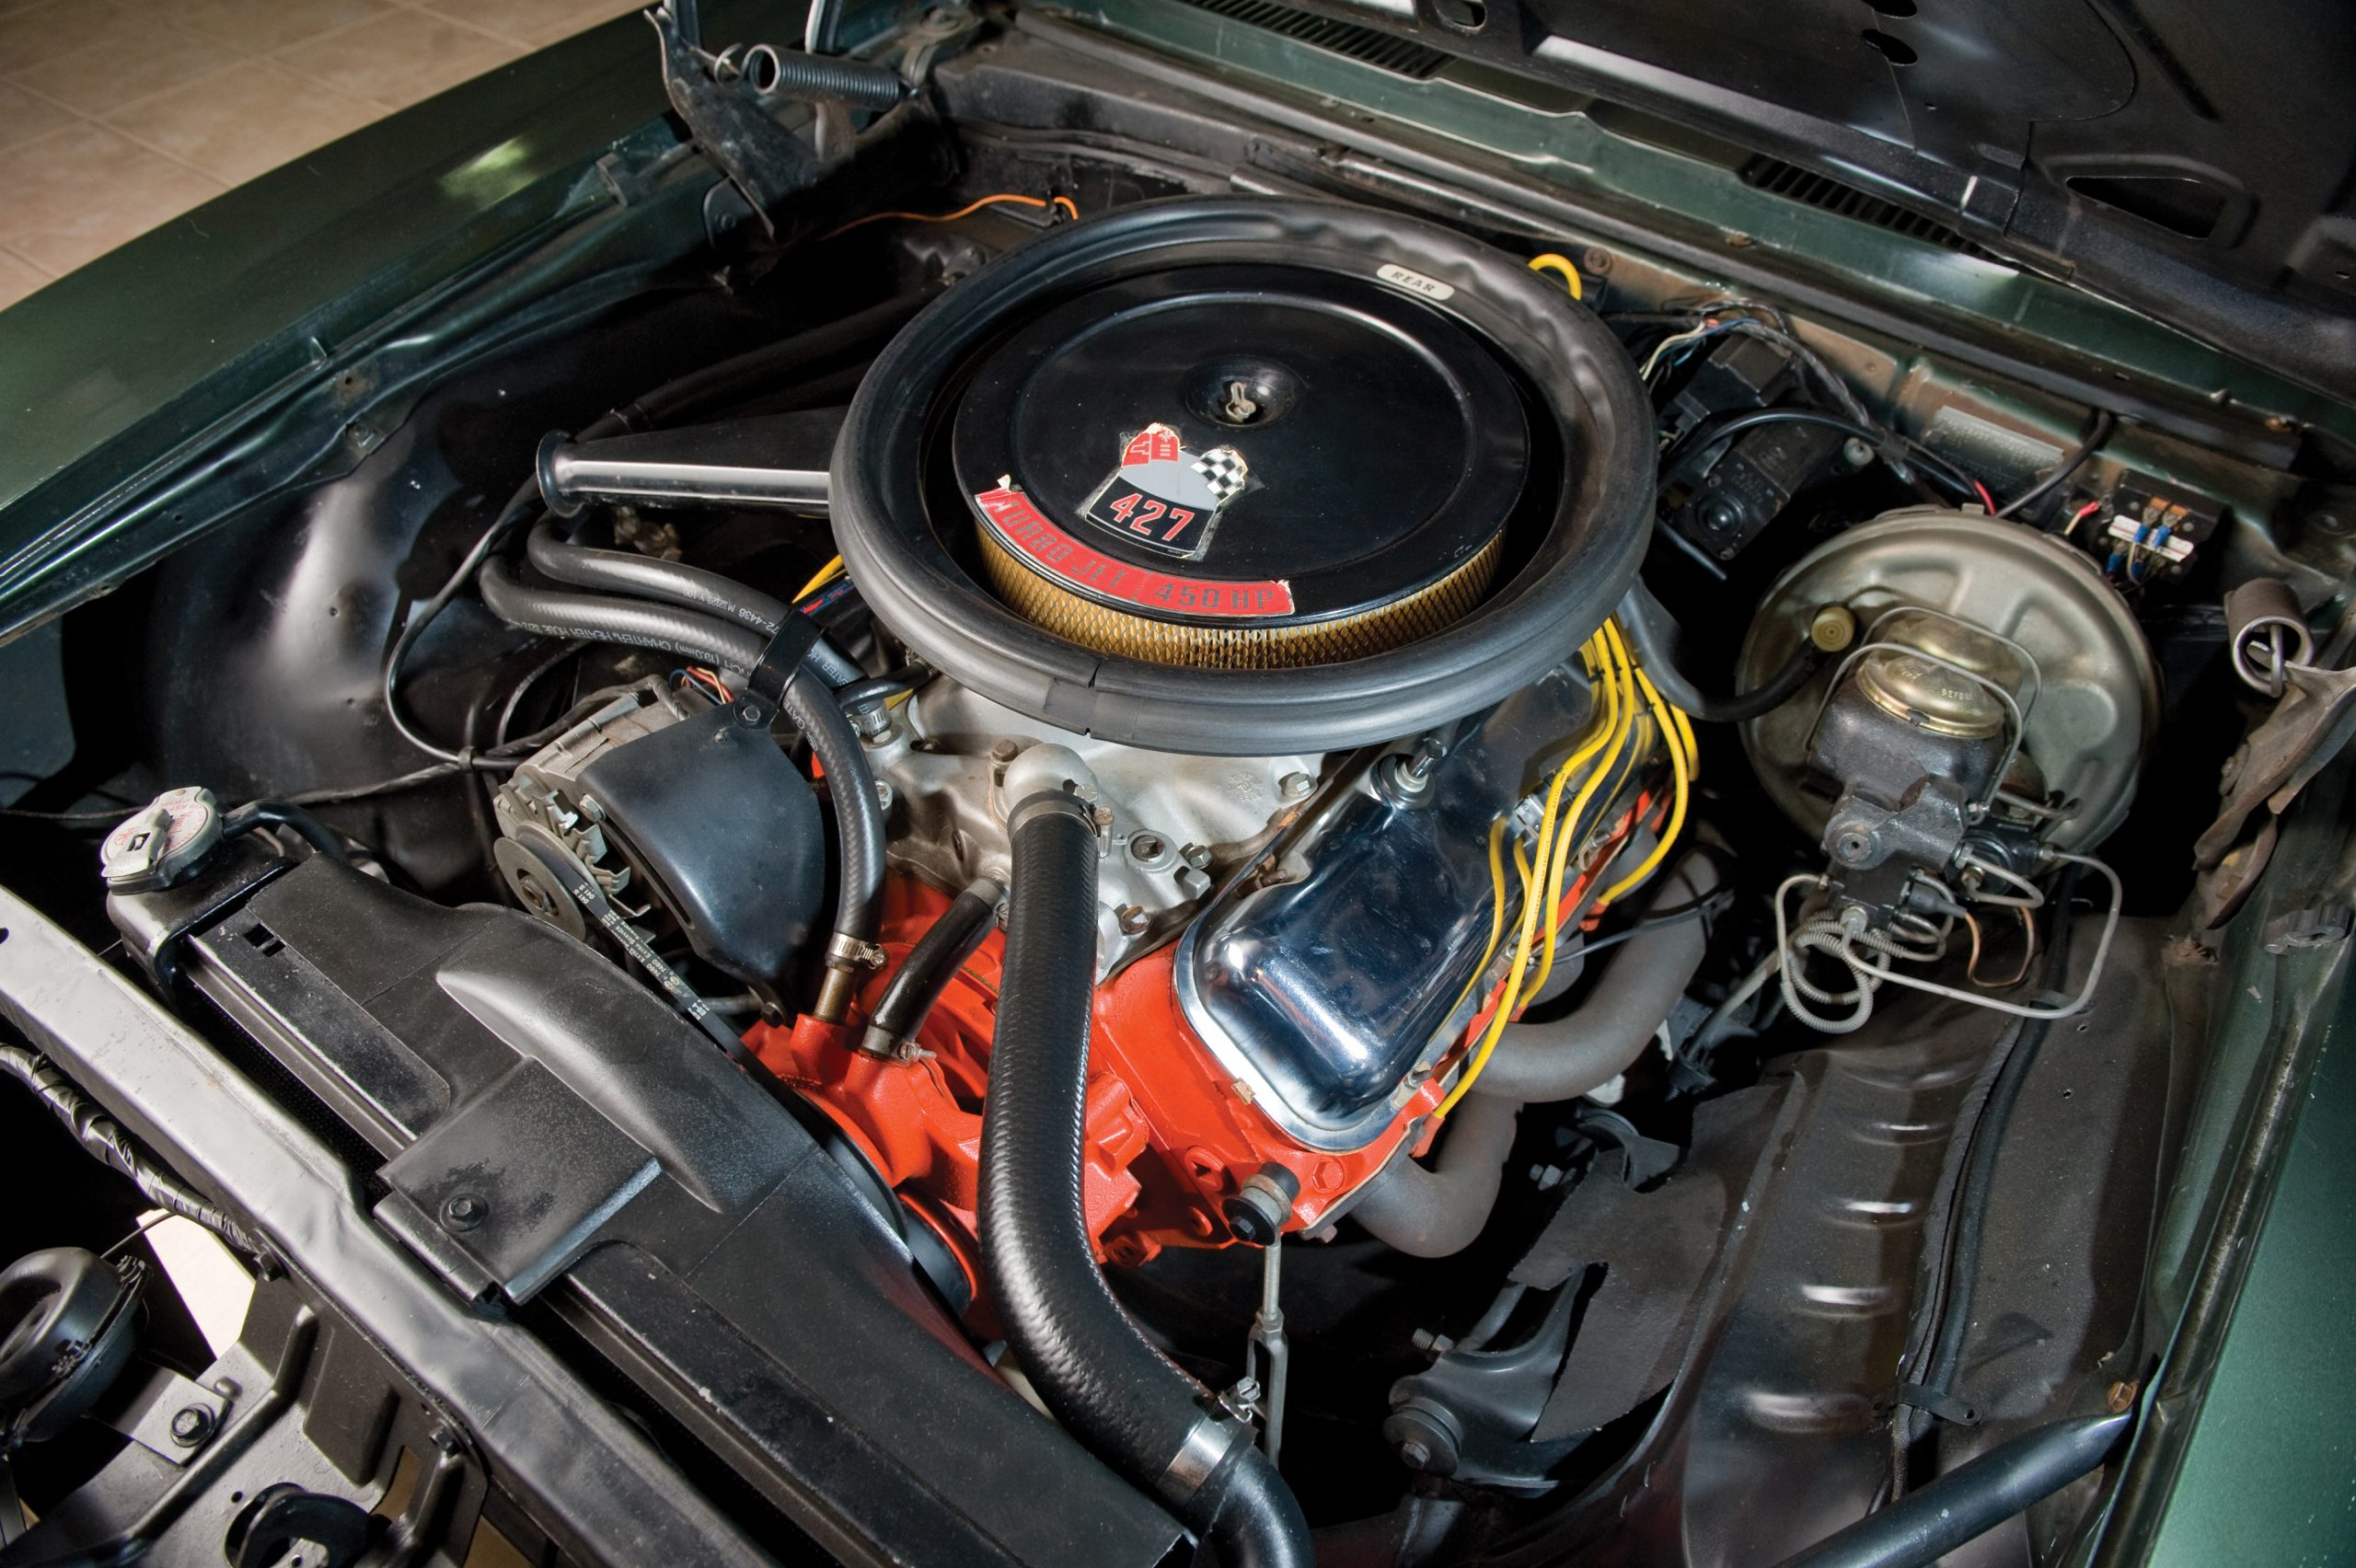 1969 Chevrolet Camaro Yenko SC 427 engine